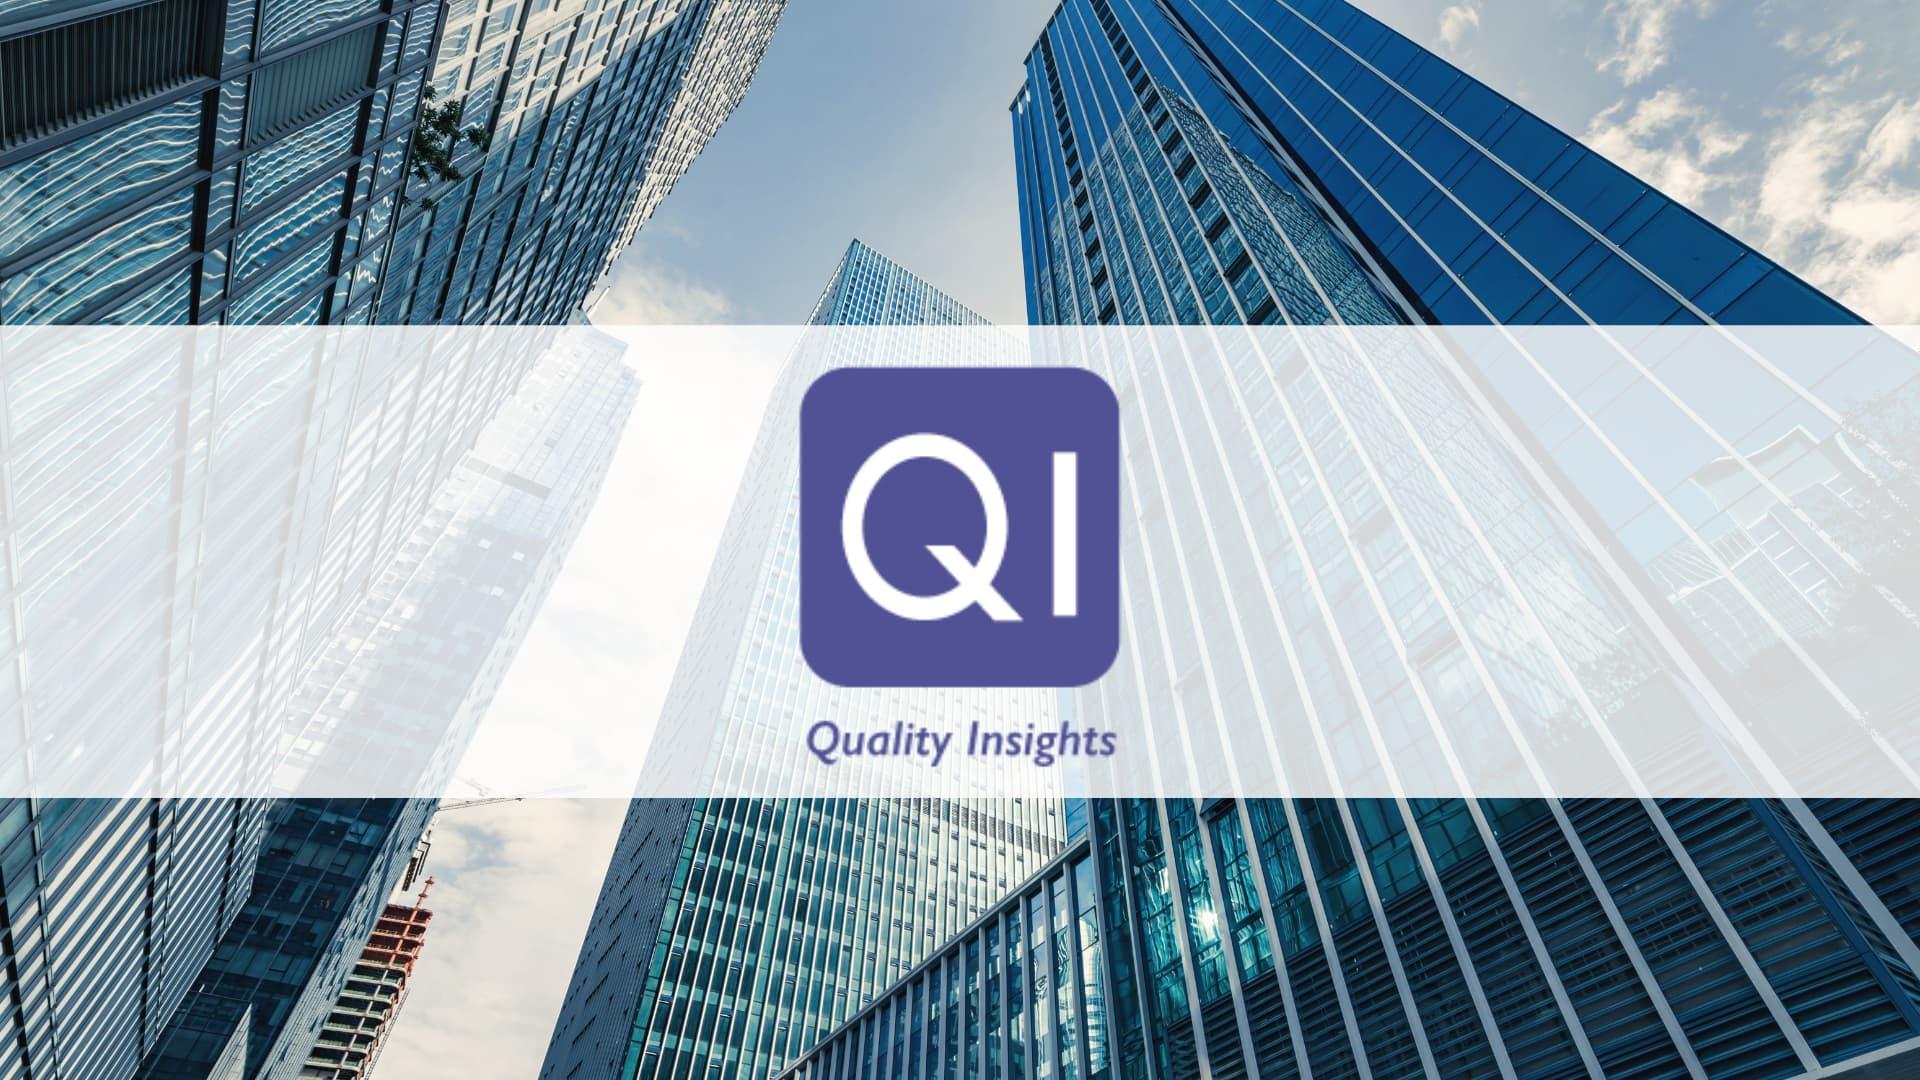 Patentcloud 最新消息:Quality Insights 推出全新總覽頁面